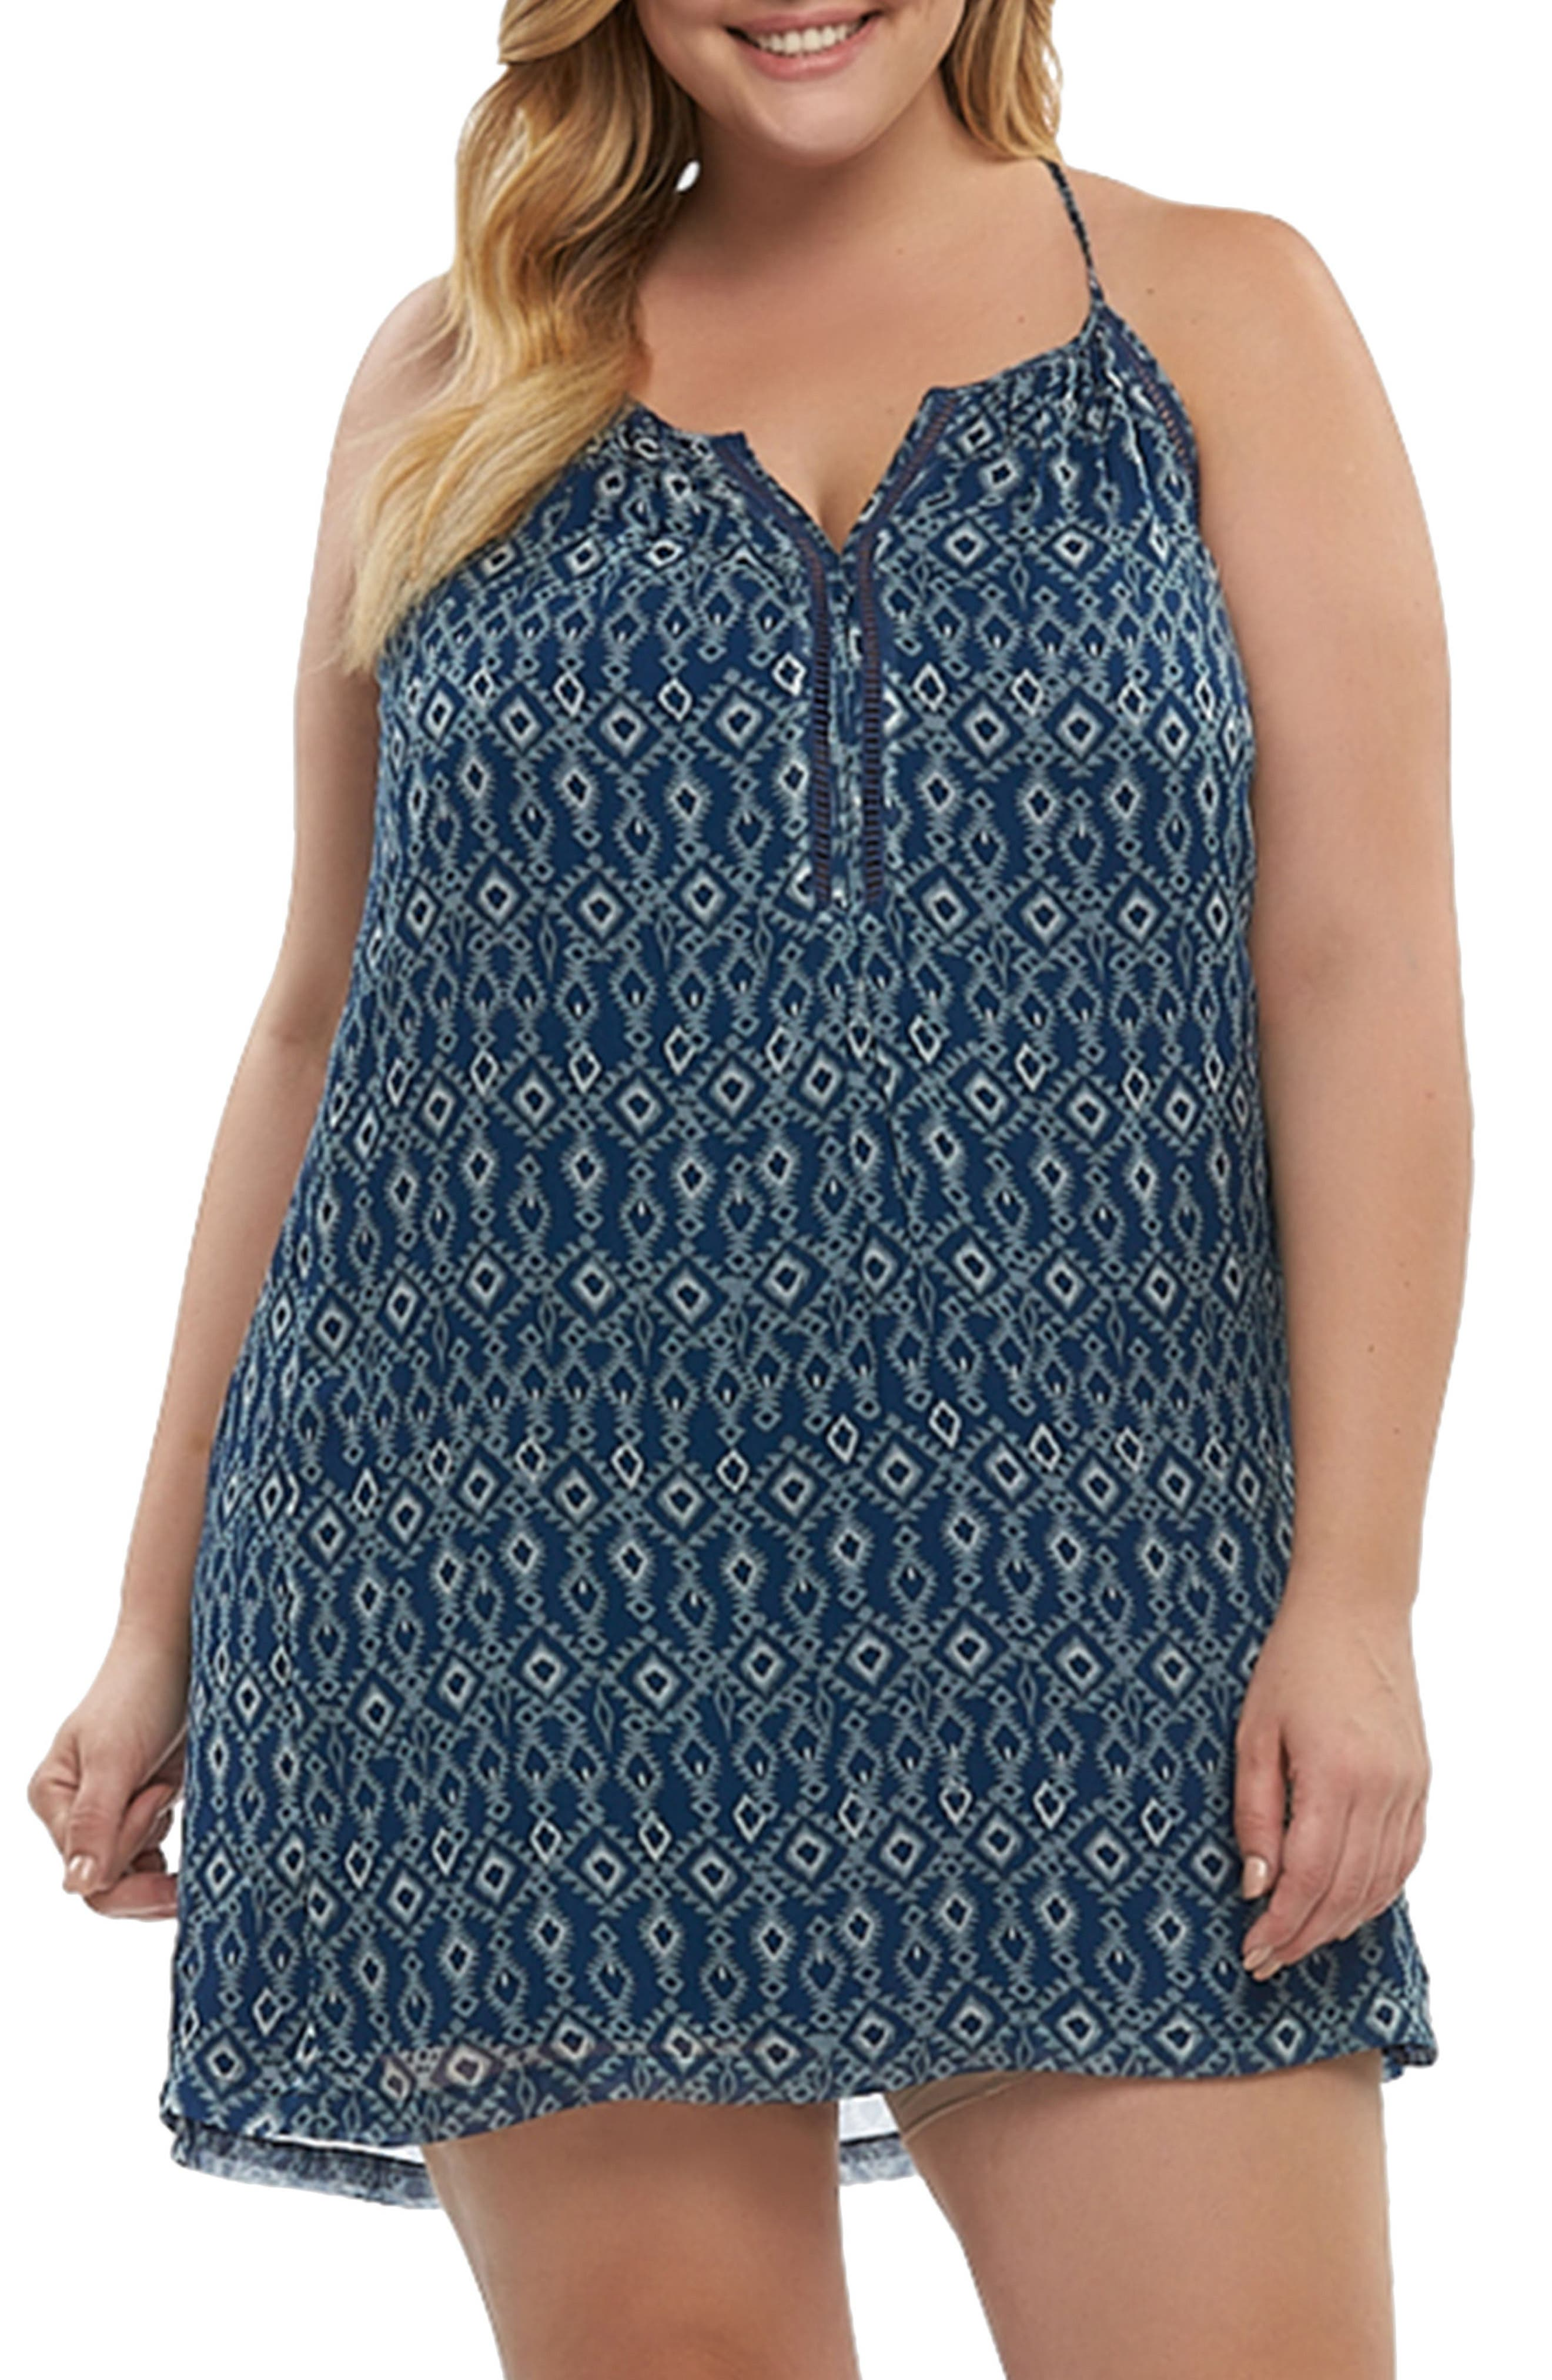 Main Image - Tart Athena Print Cover-Up Dress (Plus Size)